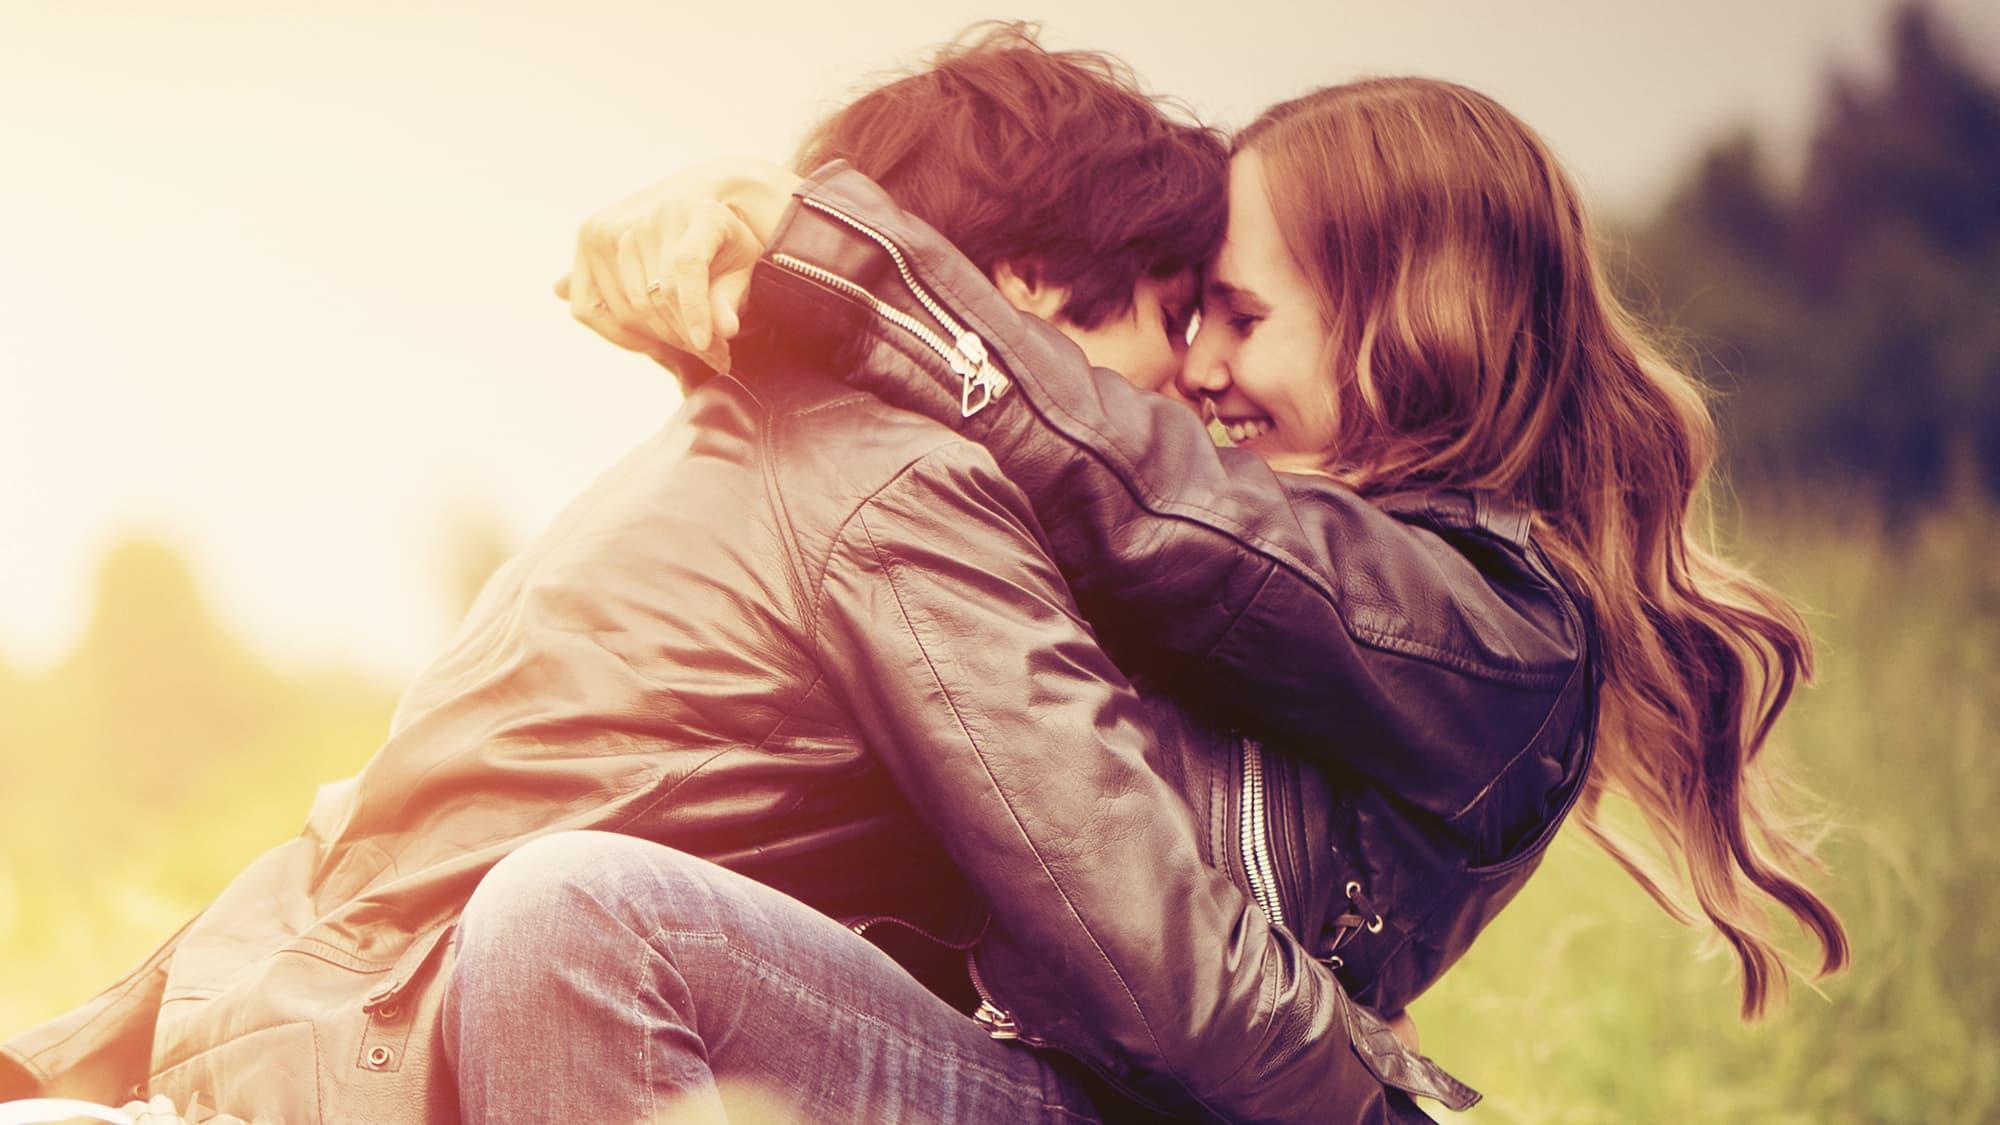 paras online Cougar dating sites